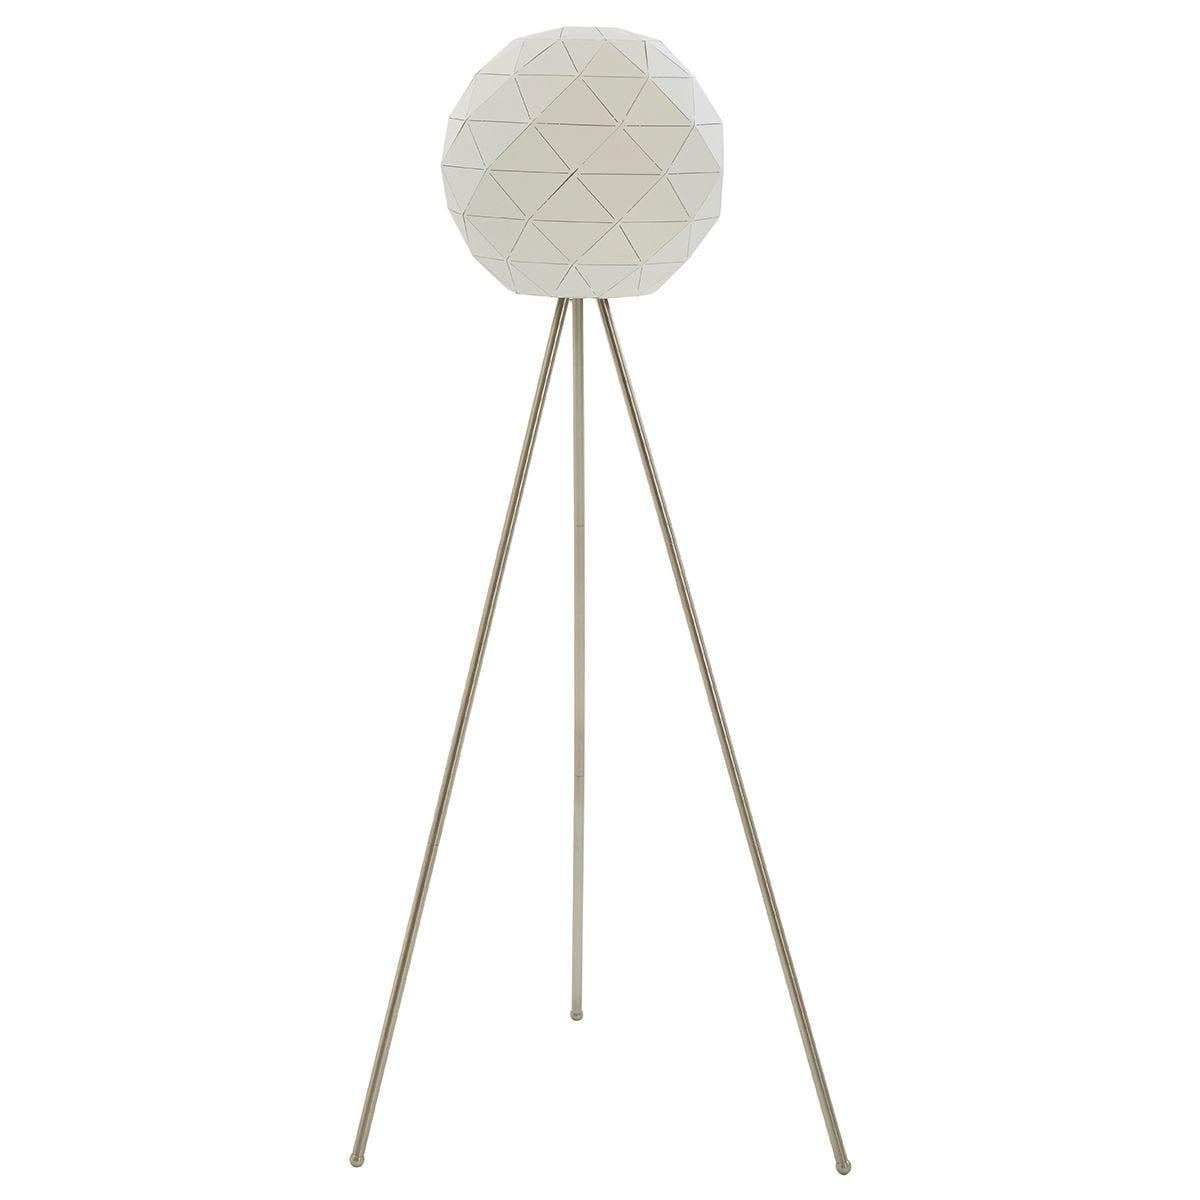 Premier Housewares Mateo Geometric Floor Lamp with Steel Base - White